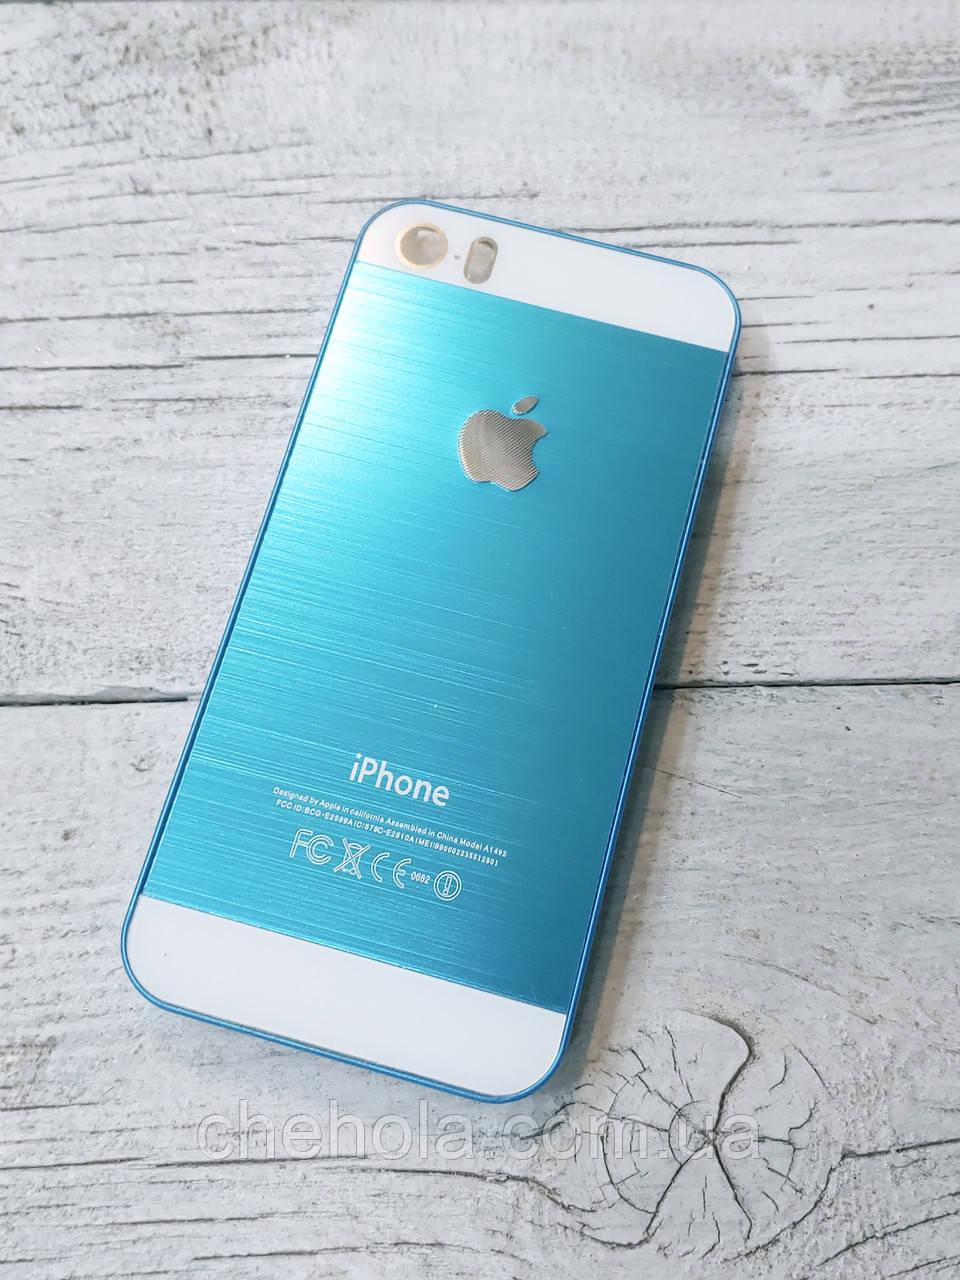 Яскравий Протиударний Чохол для iPhone 5 5S SE Металевий Блакитний